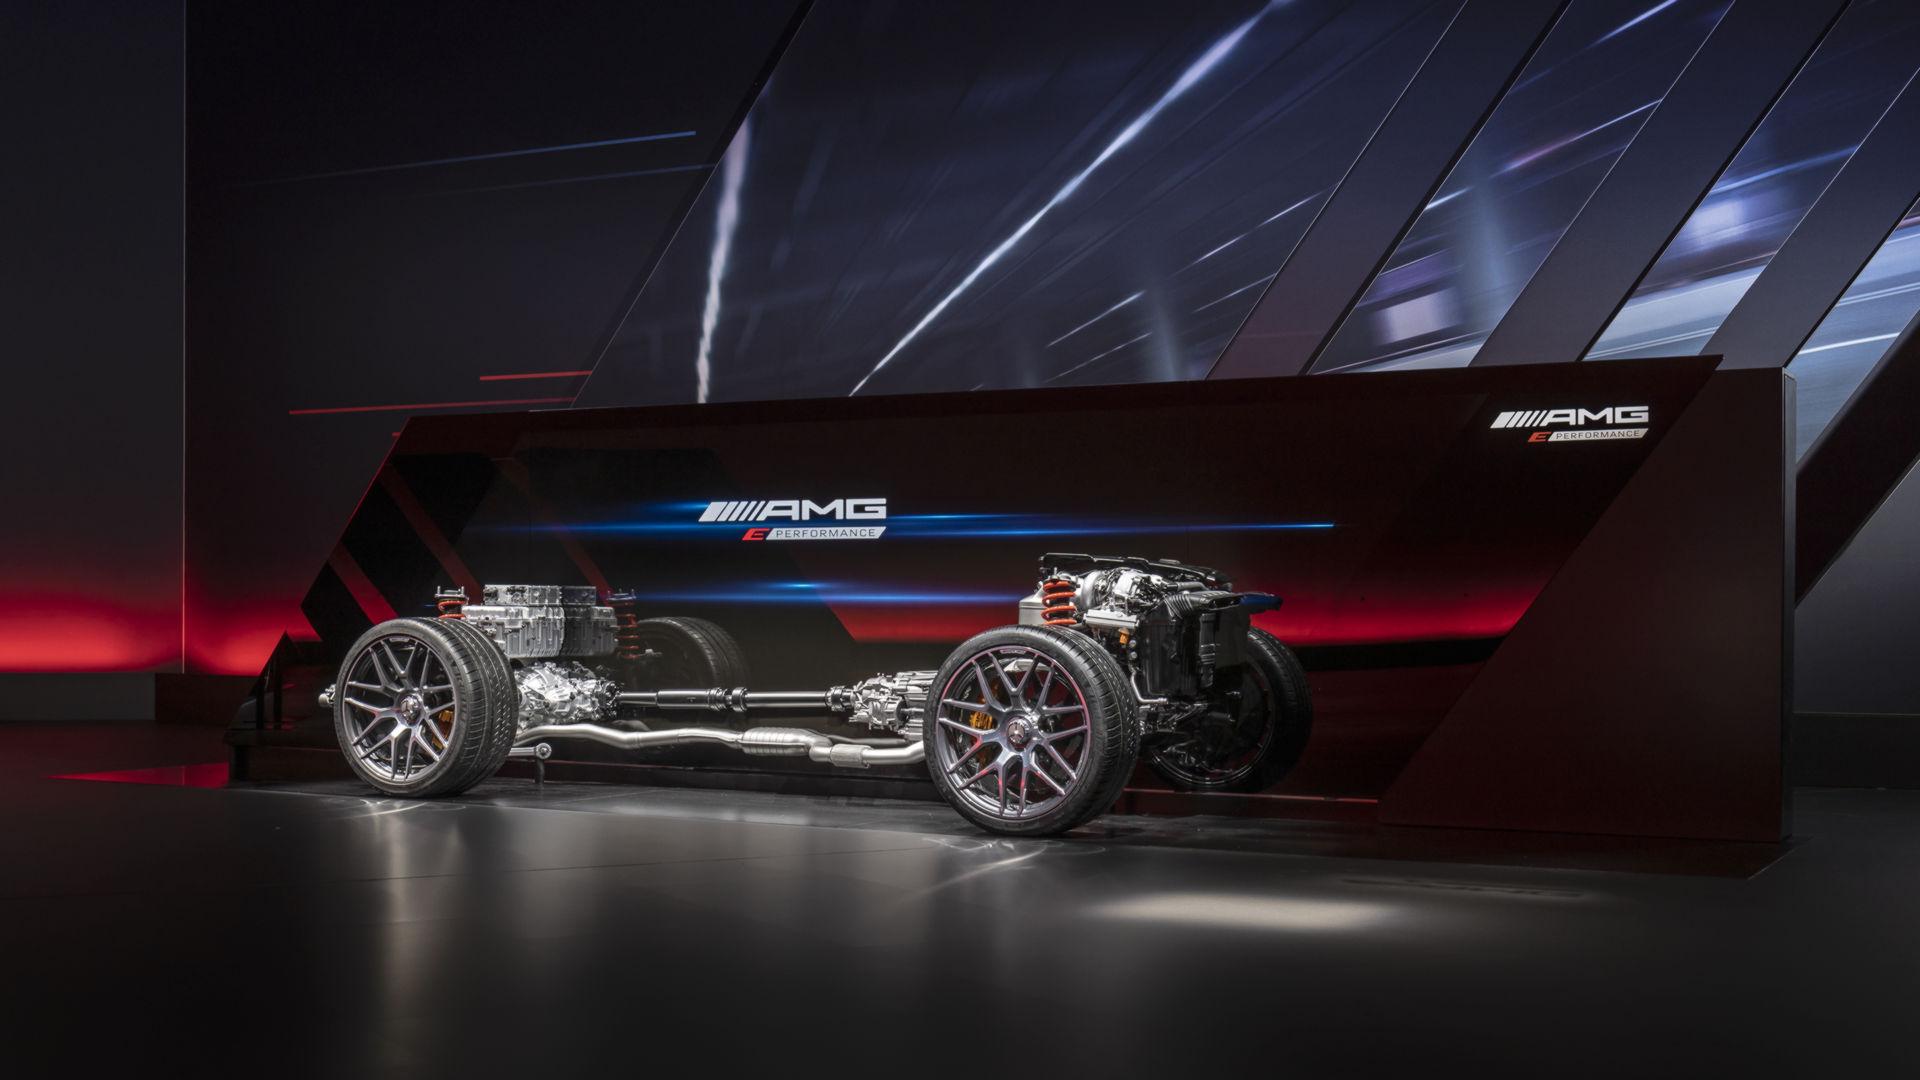 Mercedes-AMG-Ev-hybrid-19